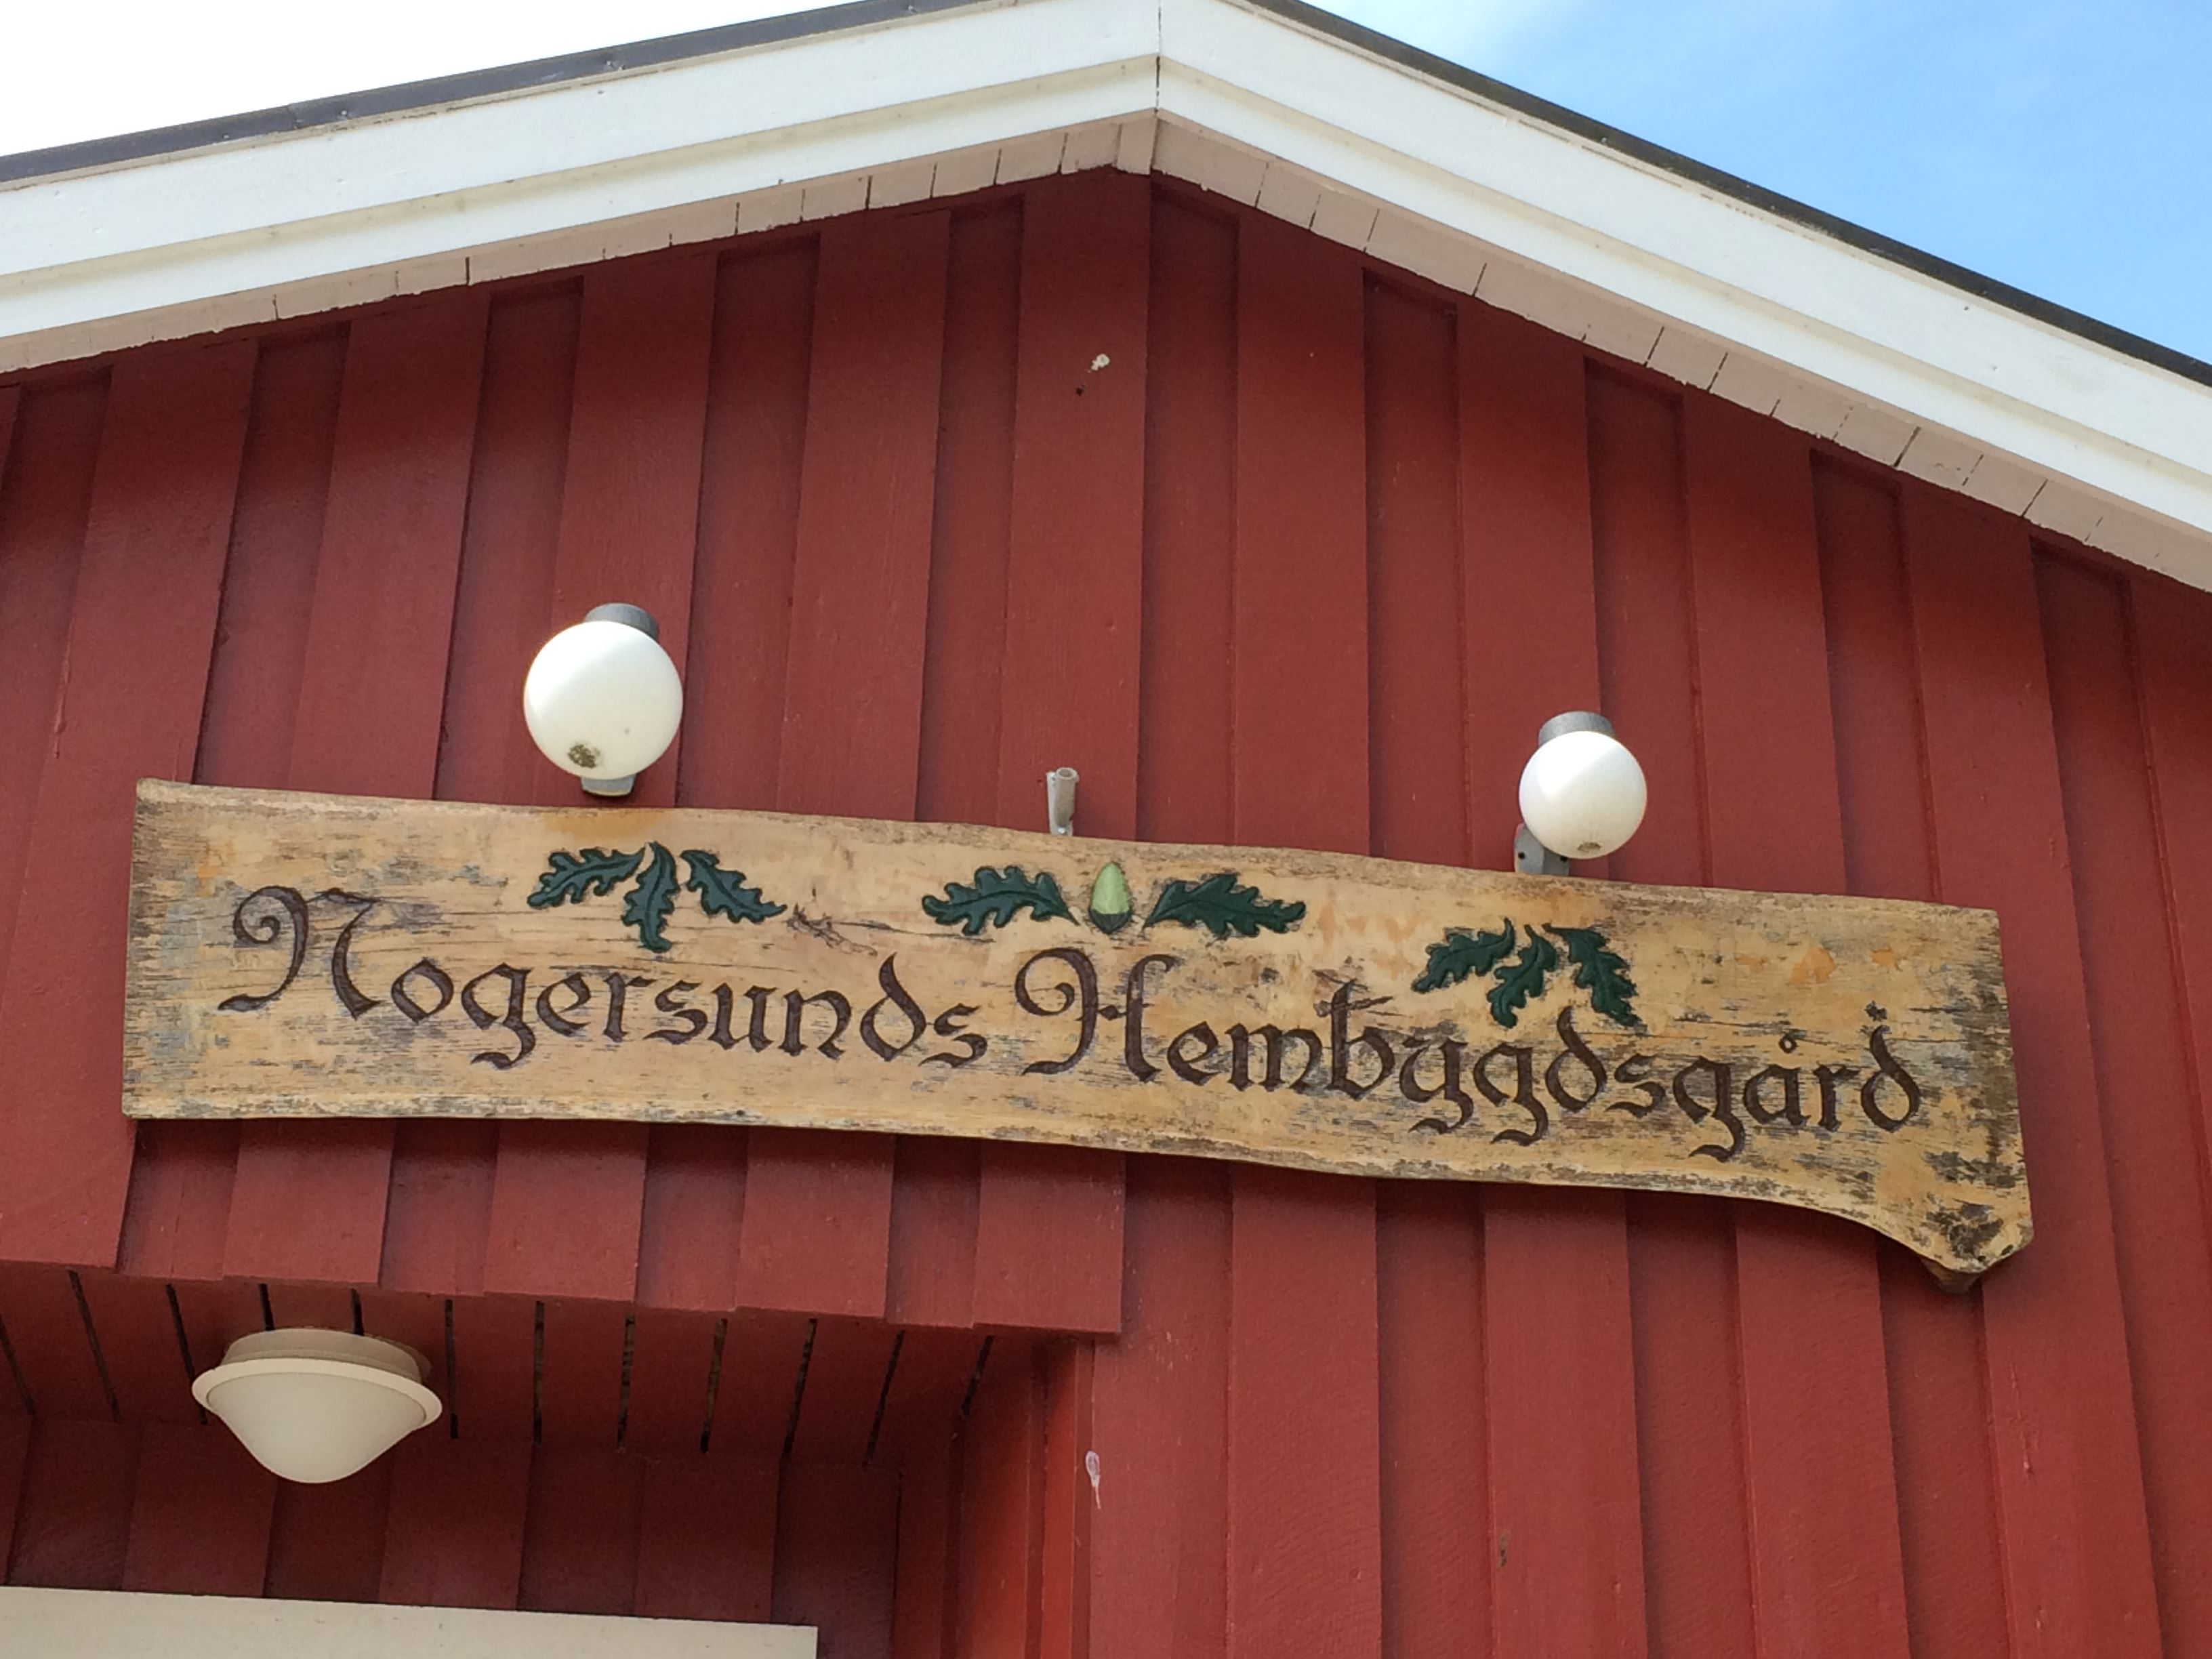 Café i Vita boden, Nogersunds hamn